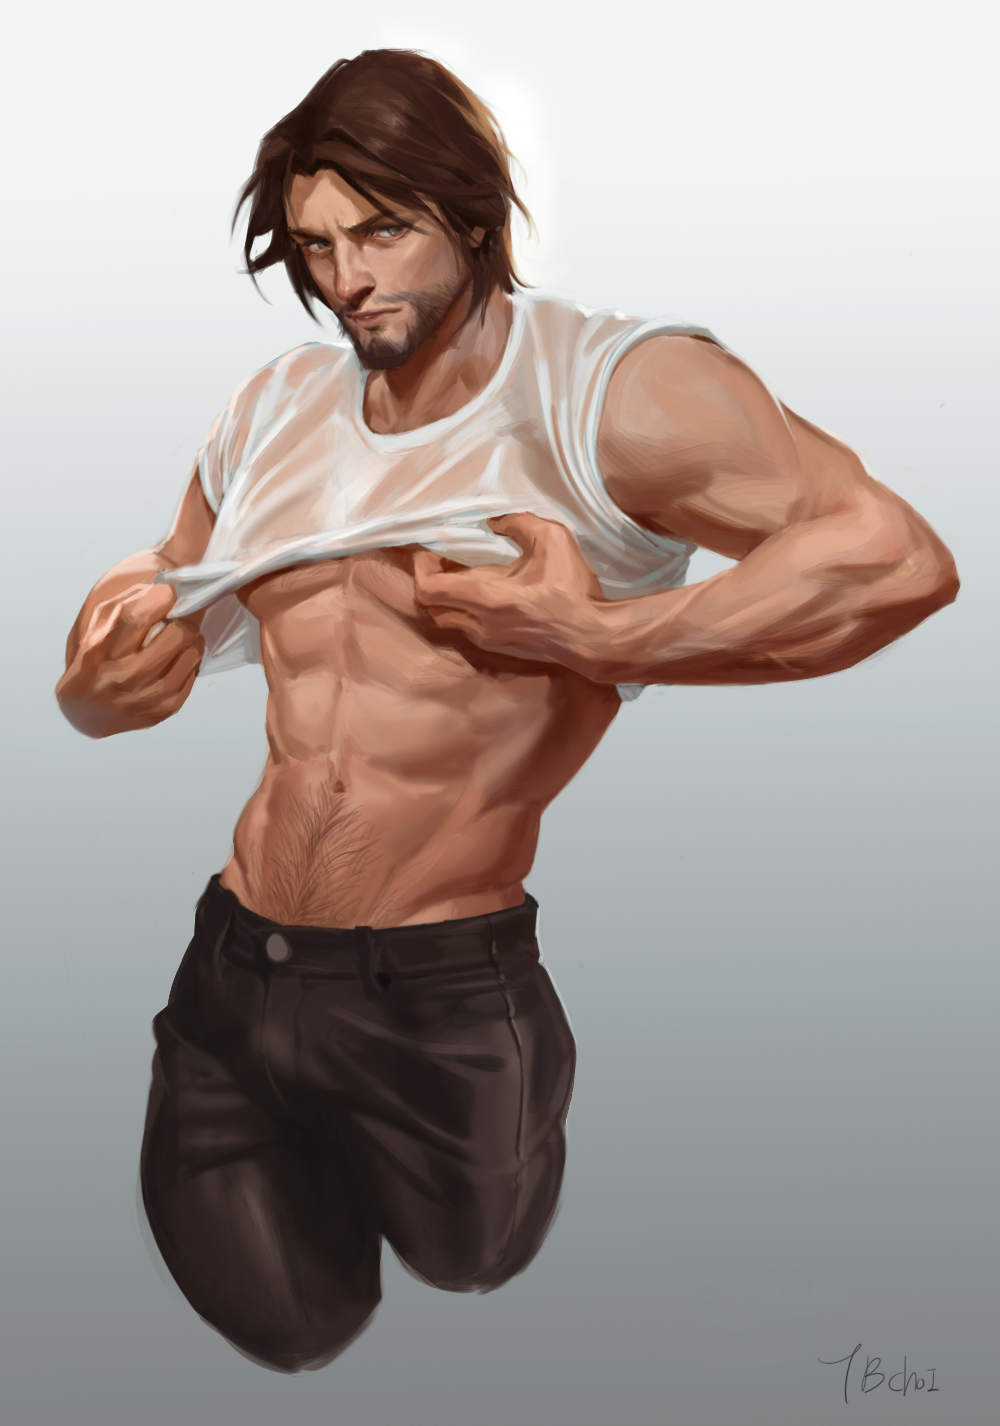 Tb Choi On Twitter Mccree Overwatch Anime Guys Shirtless Overwatch Fan Art